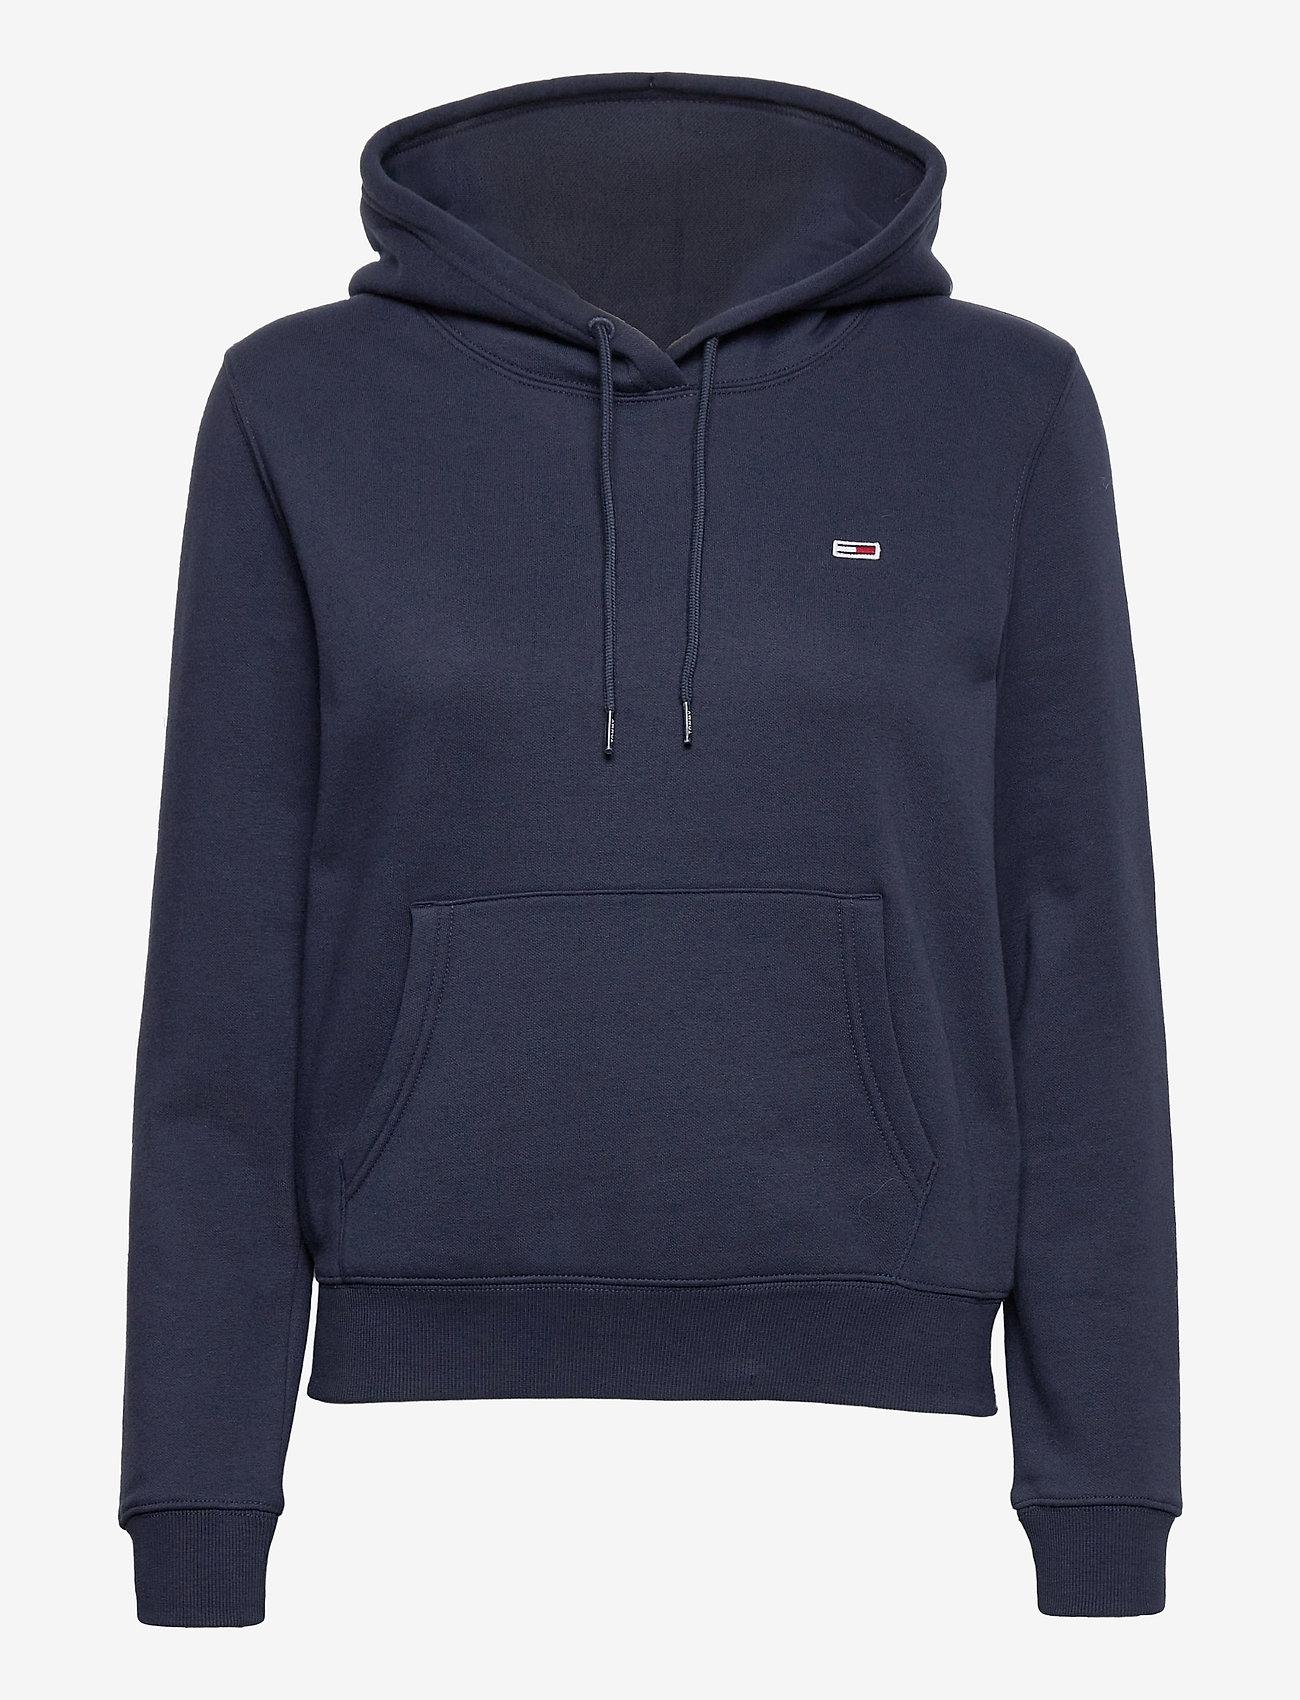 Tommy Jeans - TJW REGULAR FLEECE HOODIE - sweatshirts & hoodies - twilight navy - 0